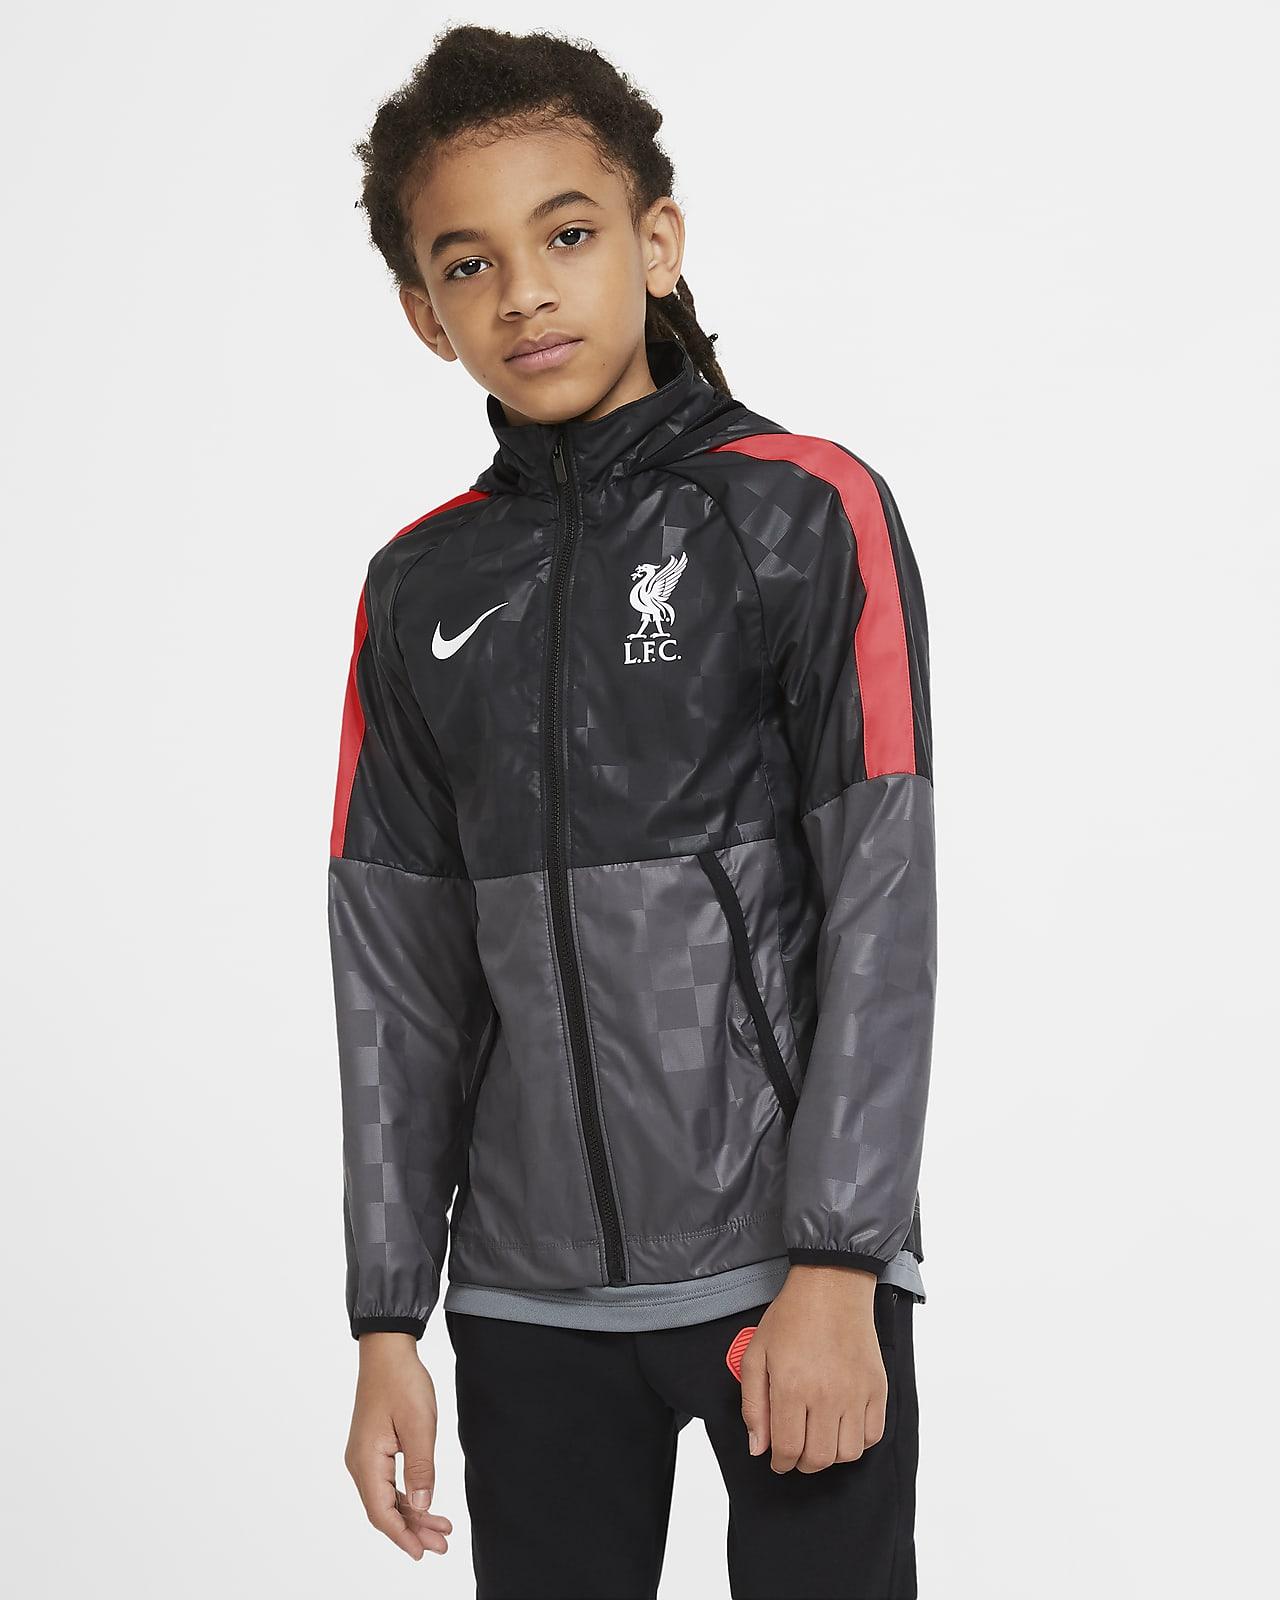 Liverpool FC AWF Chaqueta de fútbol - Niño/a